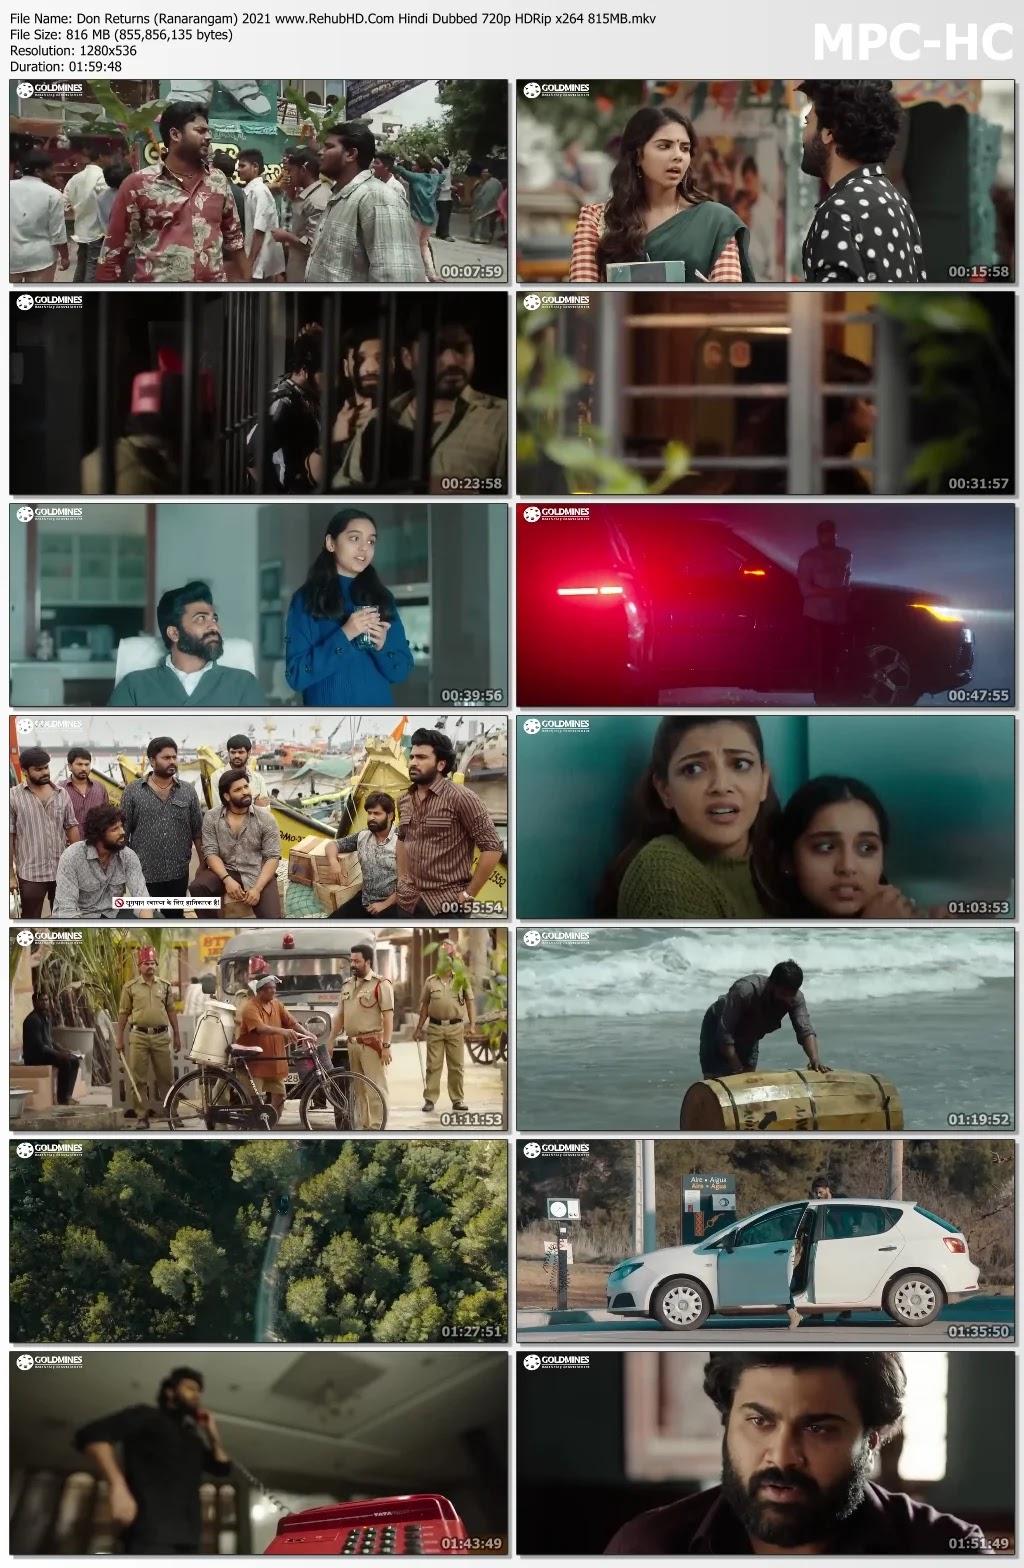 don returns ranarangam hindi dubbed download